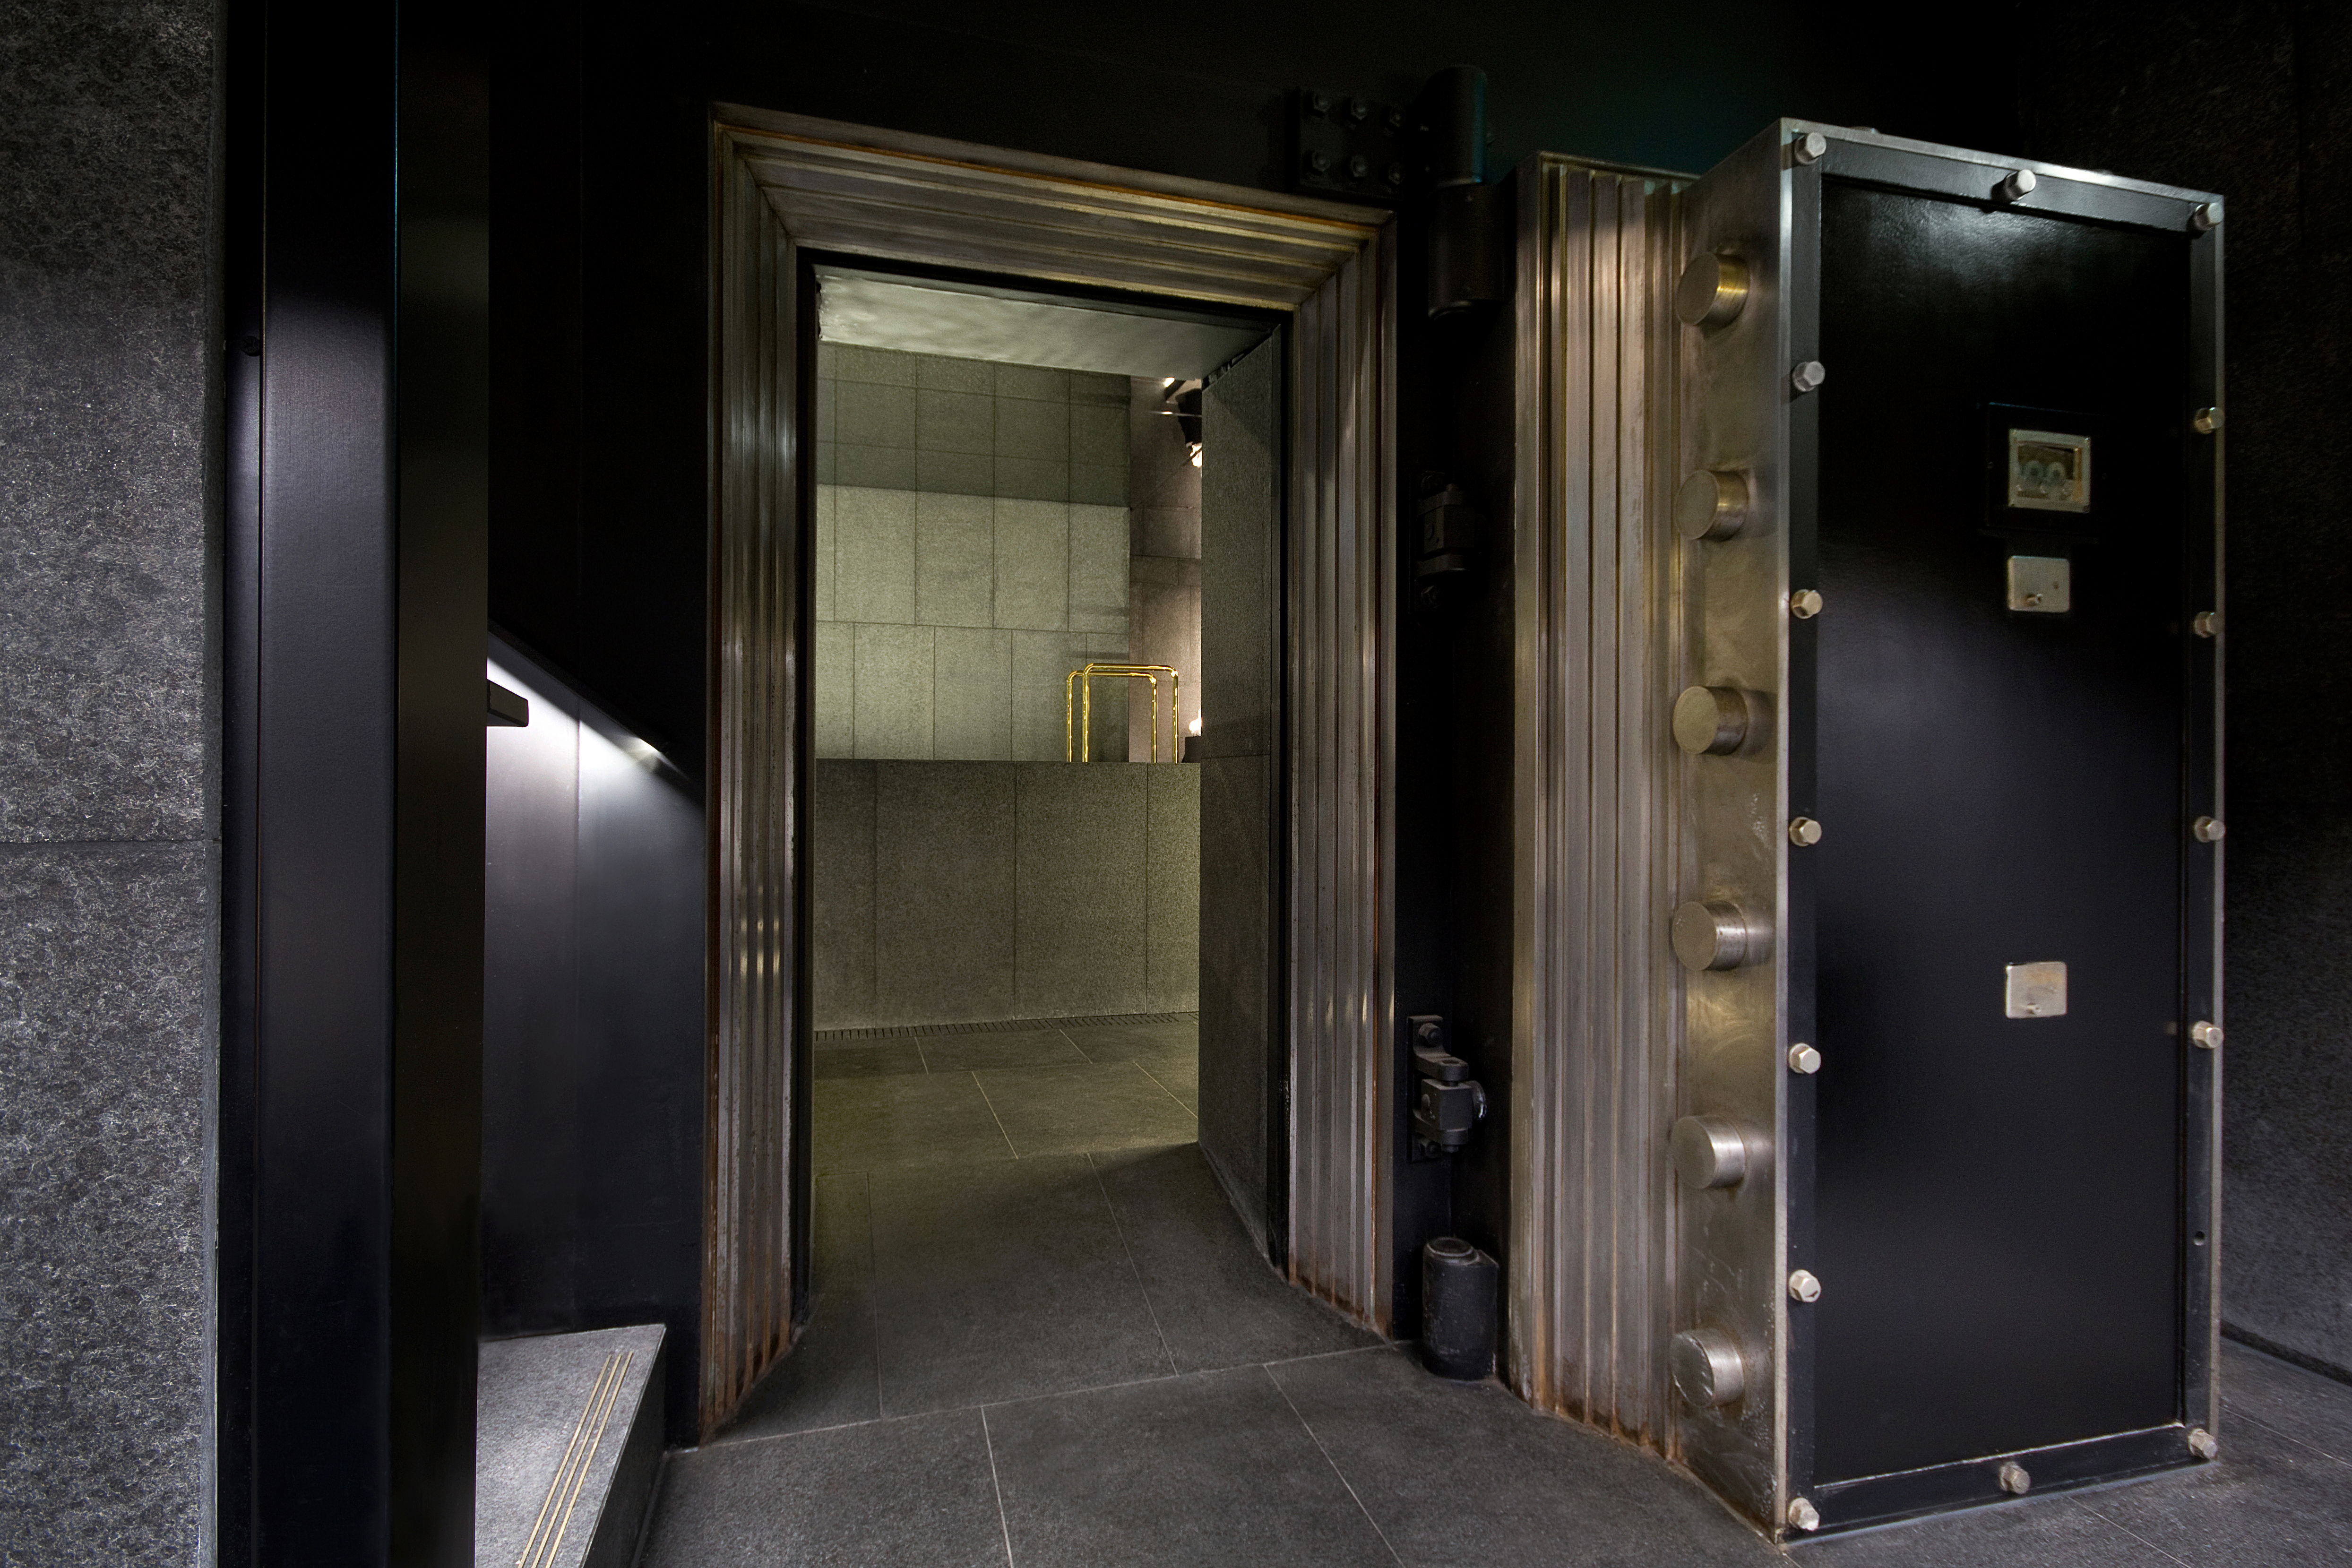 Вместо банковских сейфов - спа-салон